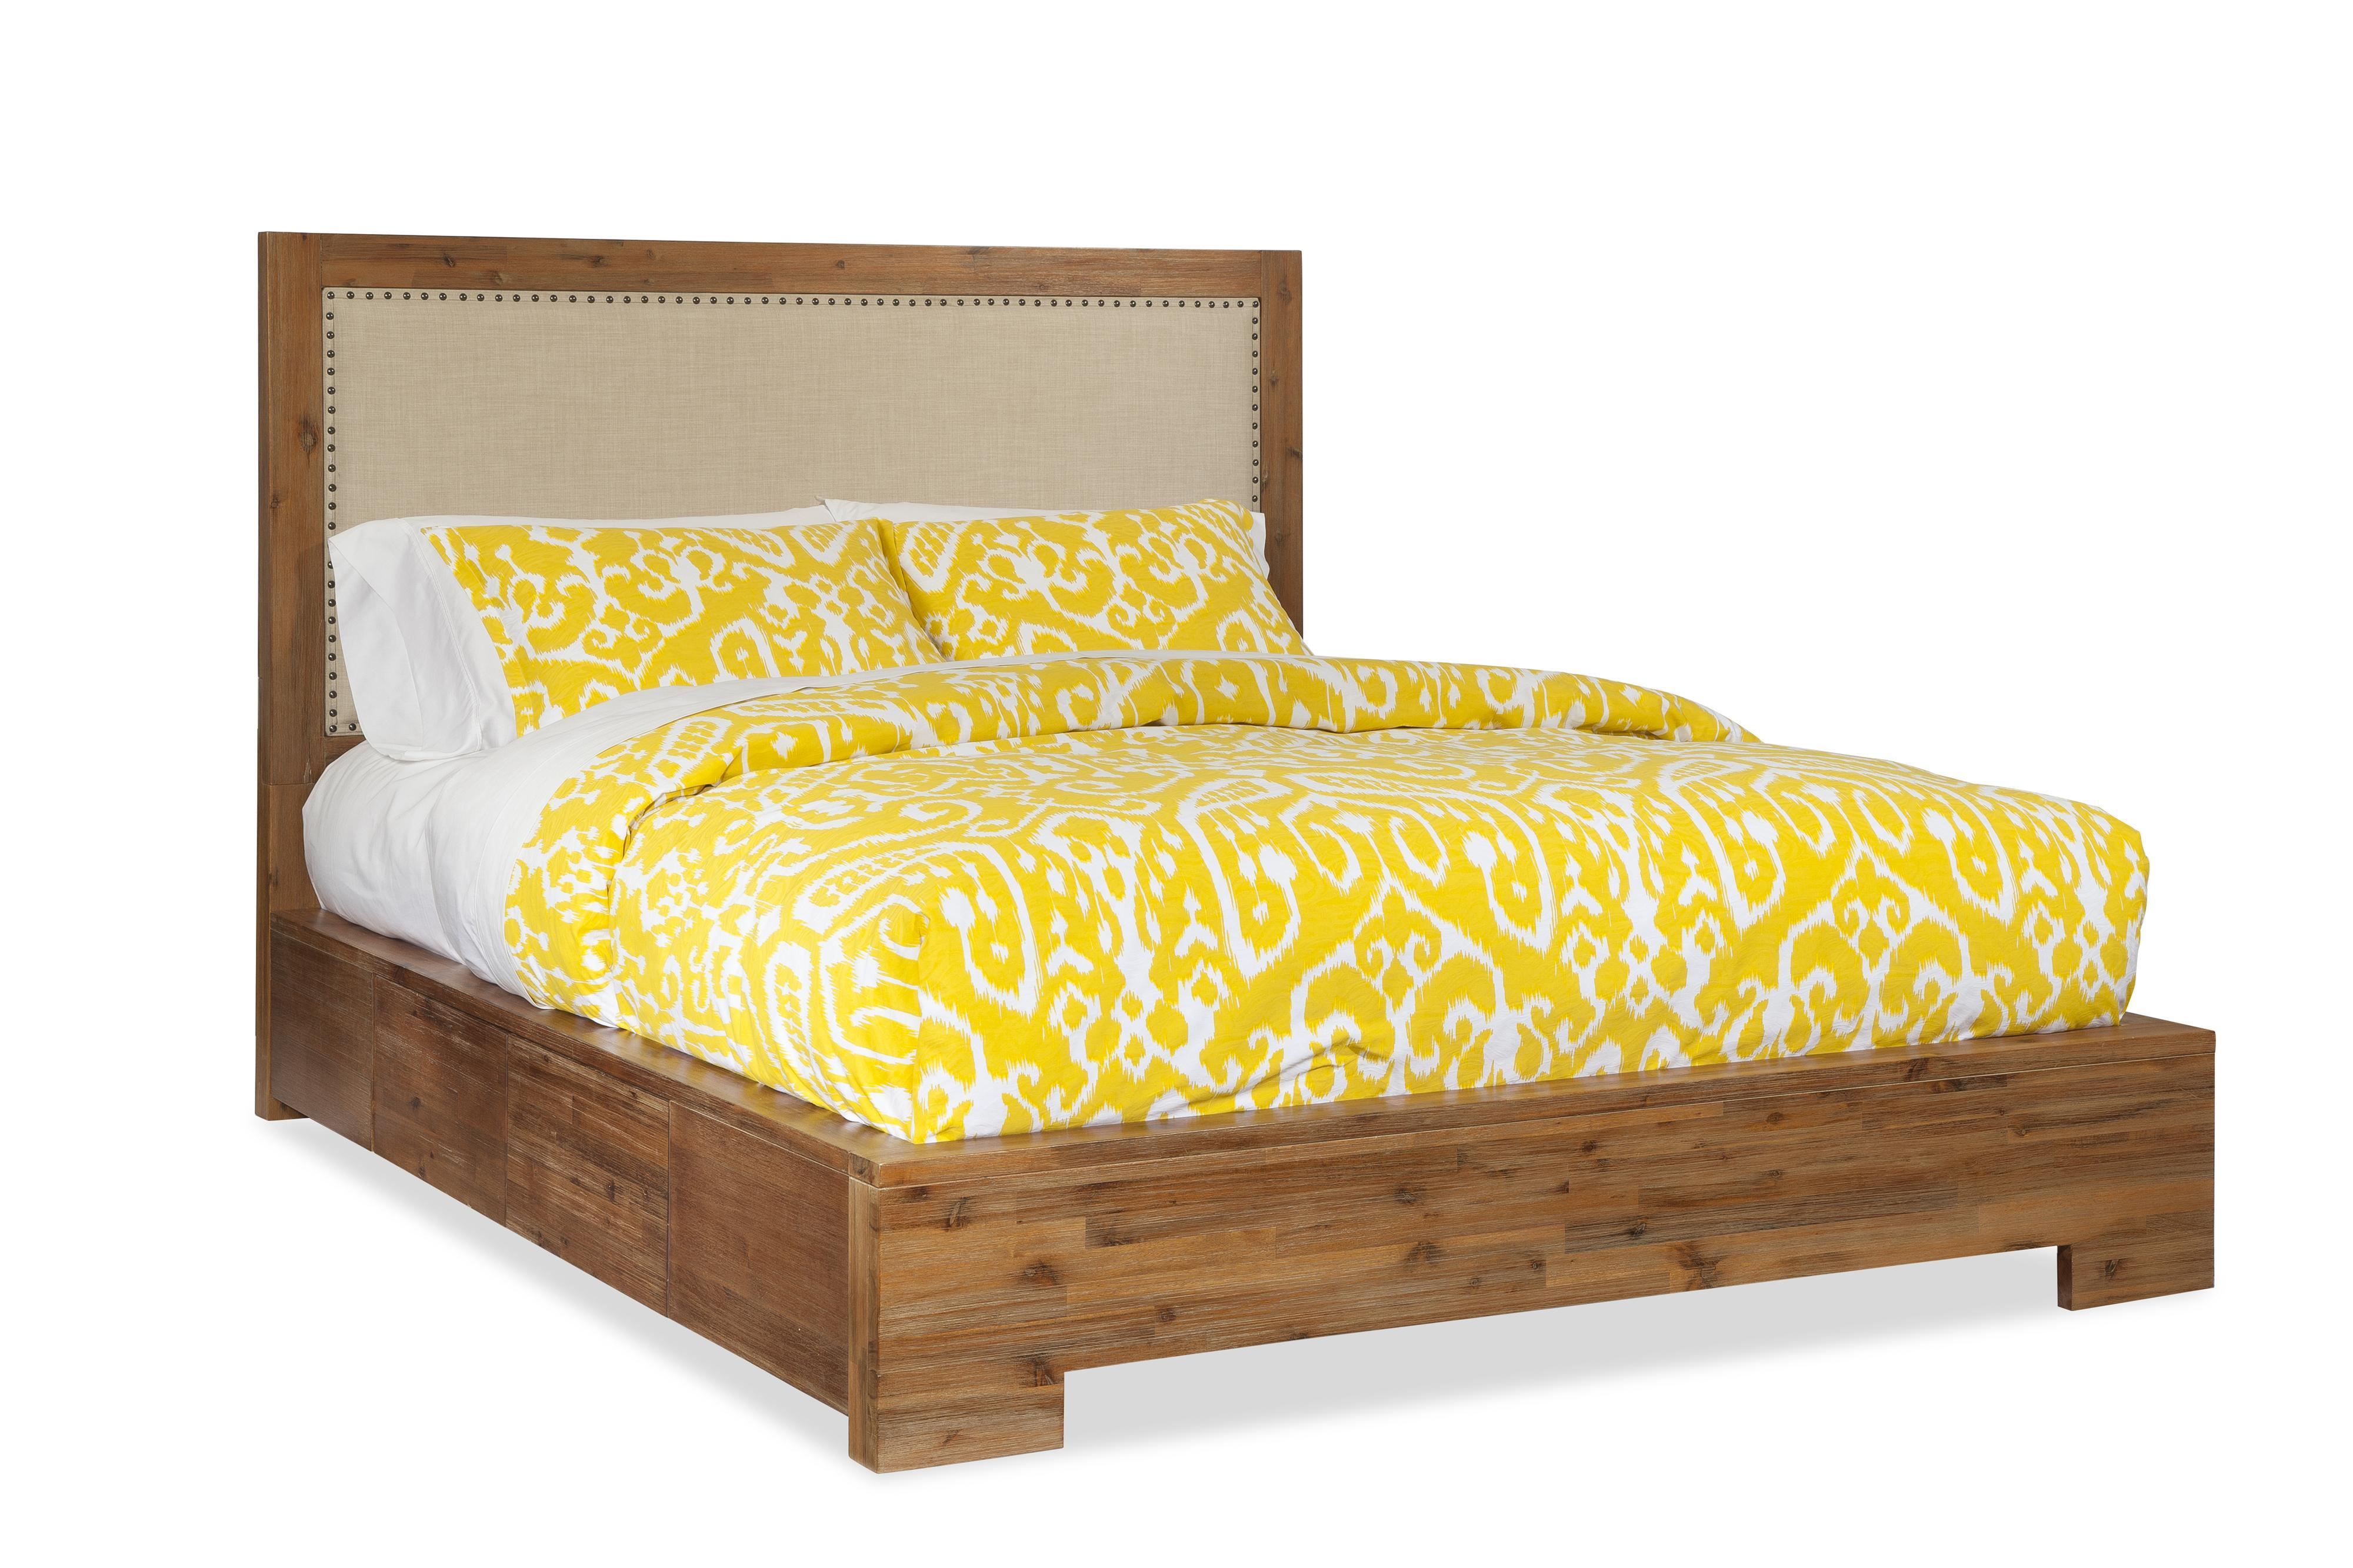 Cresent Fine Furniture Waverly Cal King Upholstered Bed - Item Number: 5533CK+CR